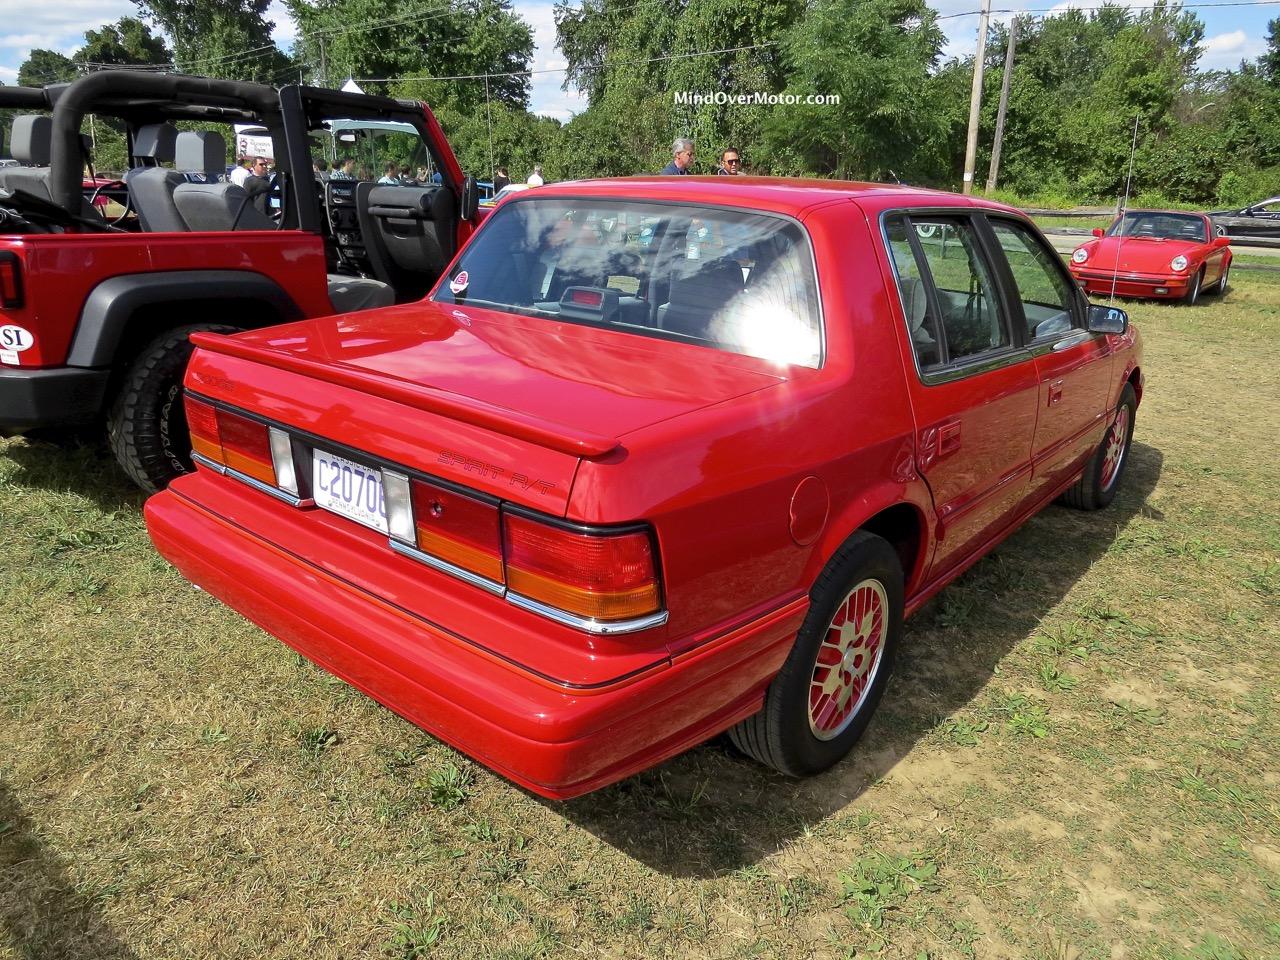 1991 Dodge Spirit R:T Rear 1